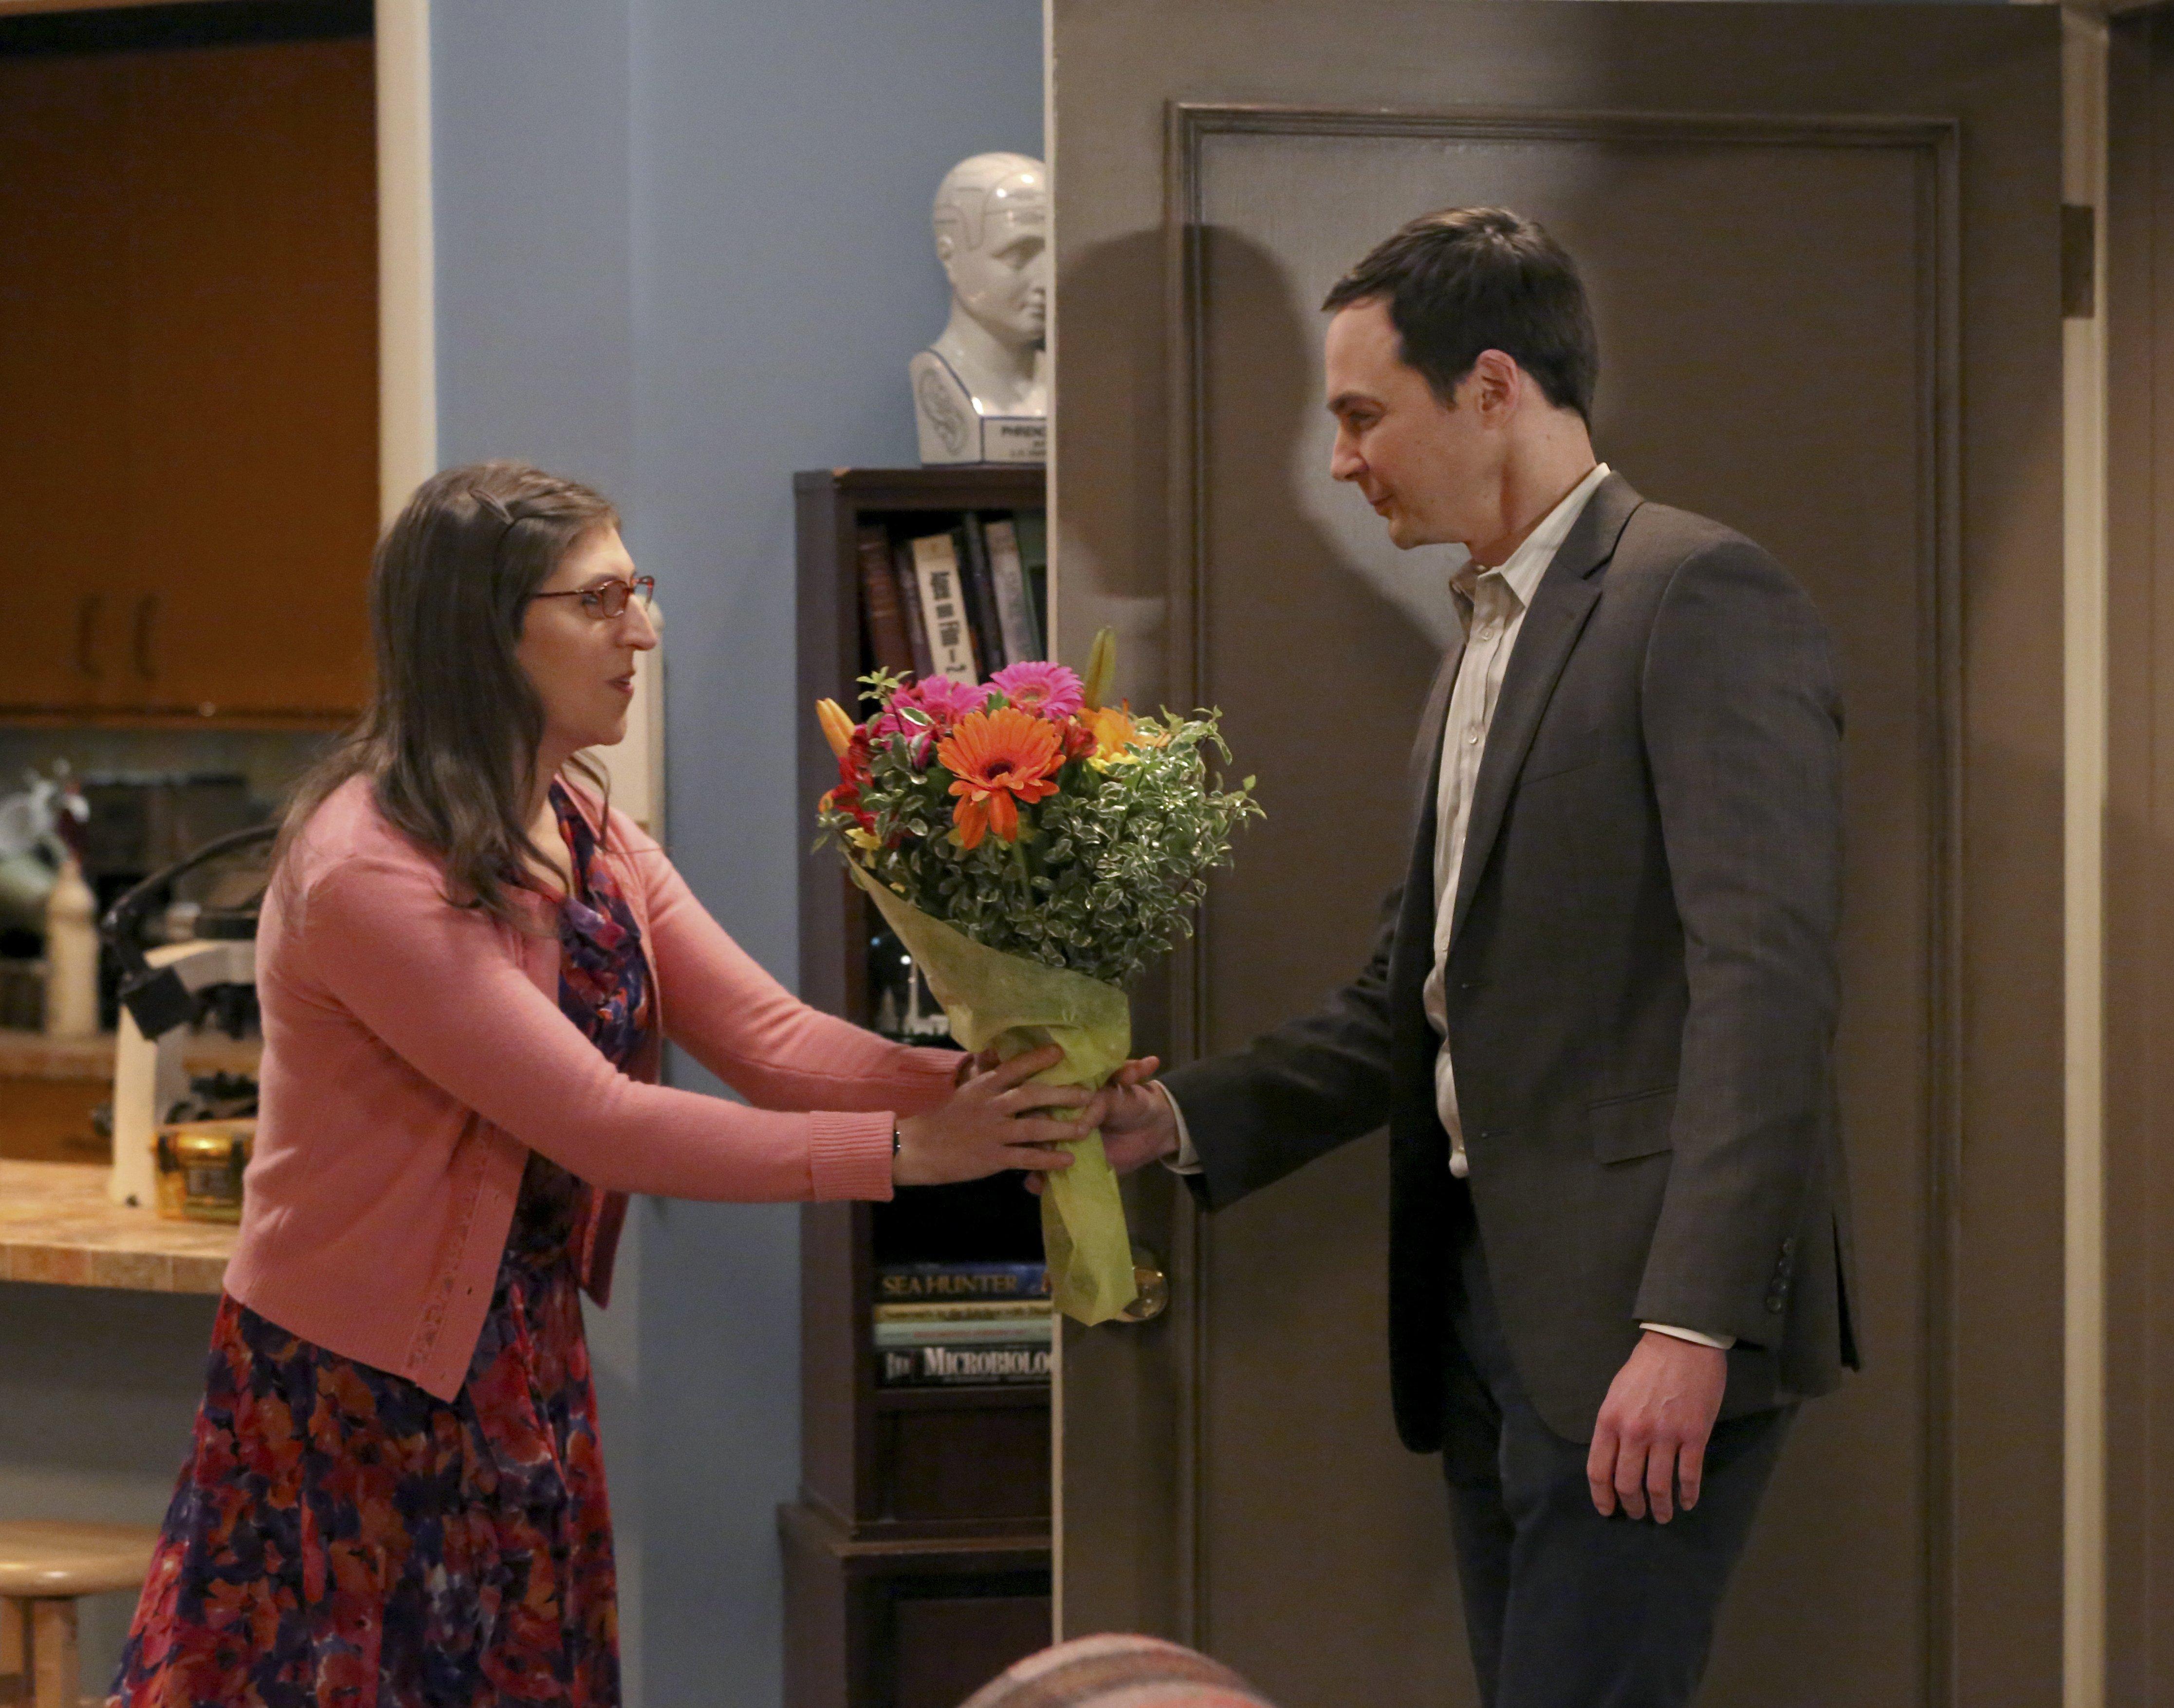 The Big Bang Theory - Series 09 Episode 11 The Opening Night Excitation Characters names Sheldon, Penny, Leonard, Howard, Raj © Warner Bros. Entertainment, Inc.  Sky pics, TL